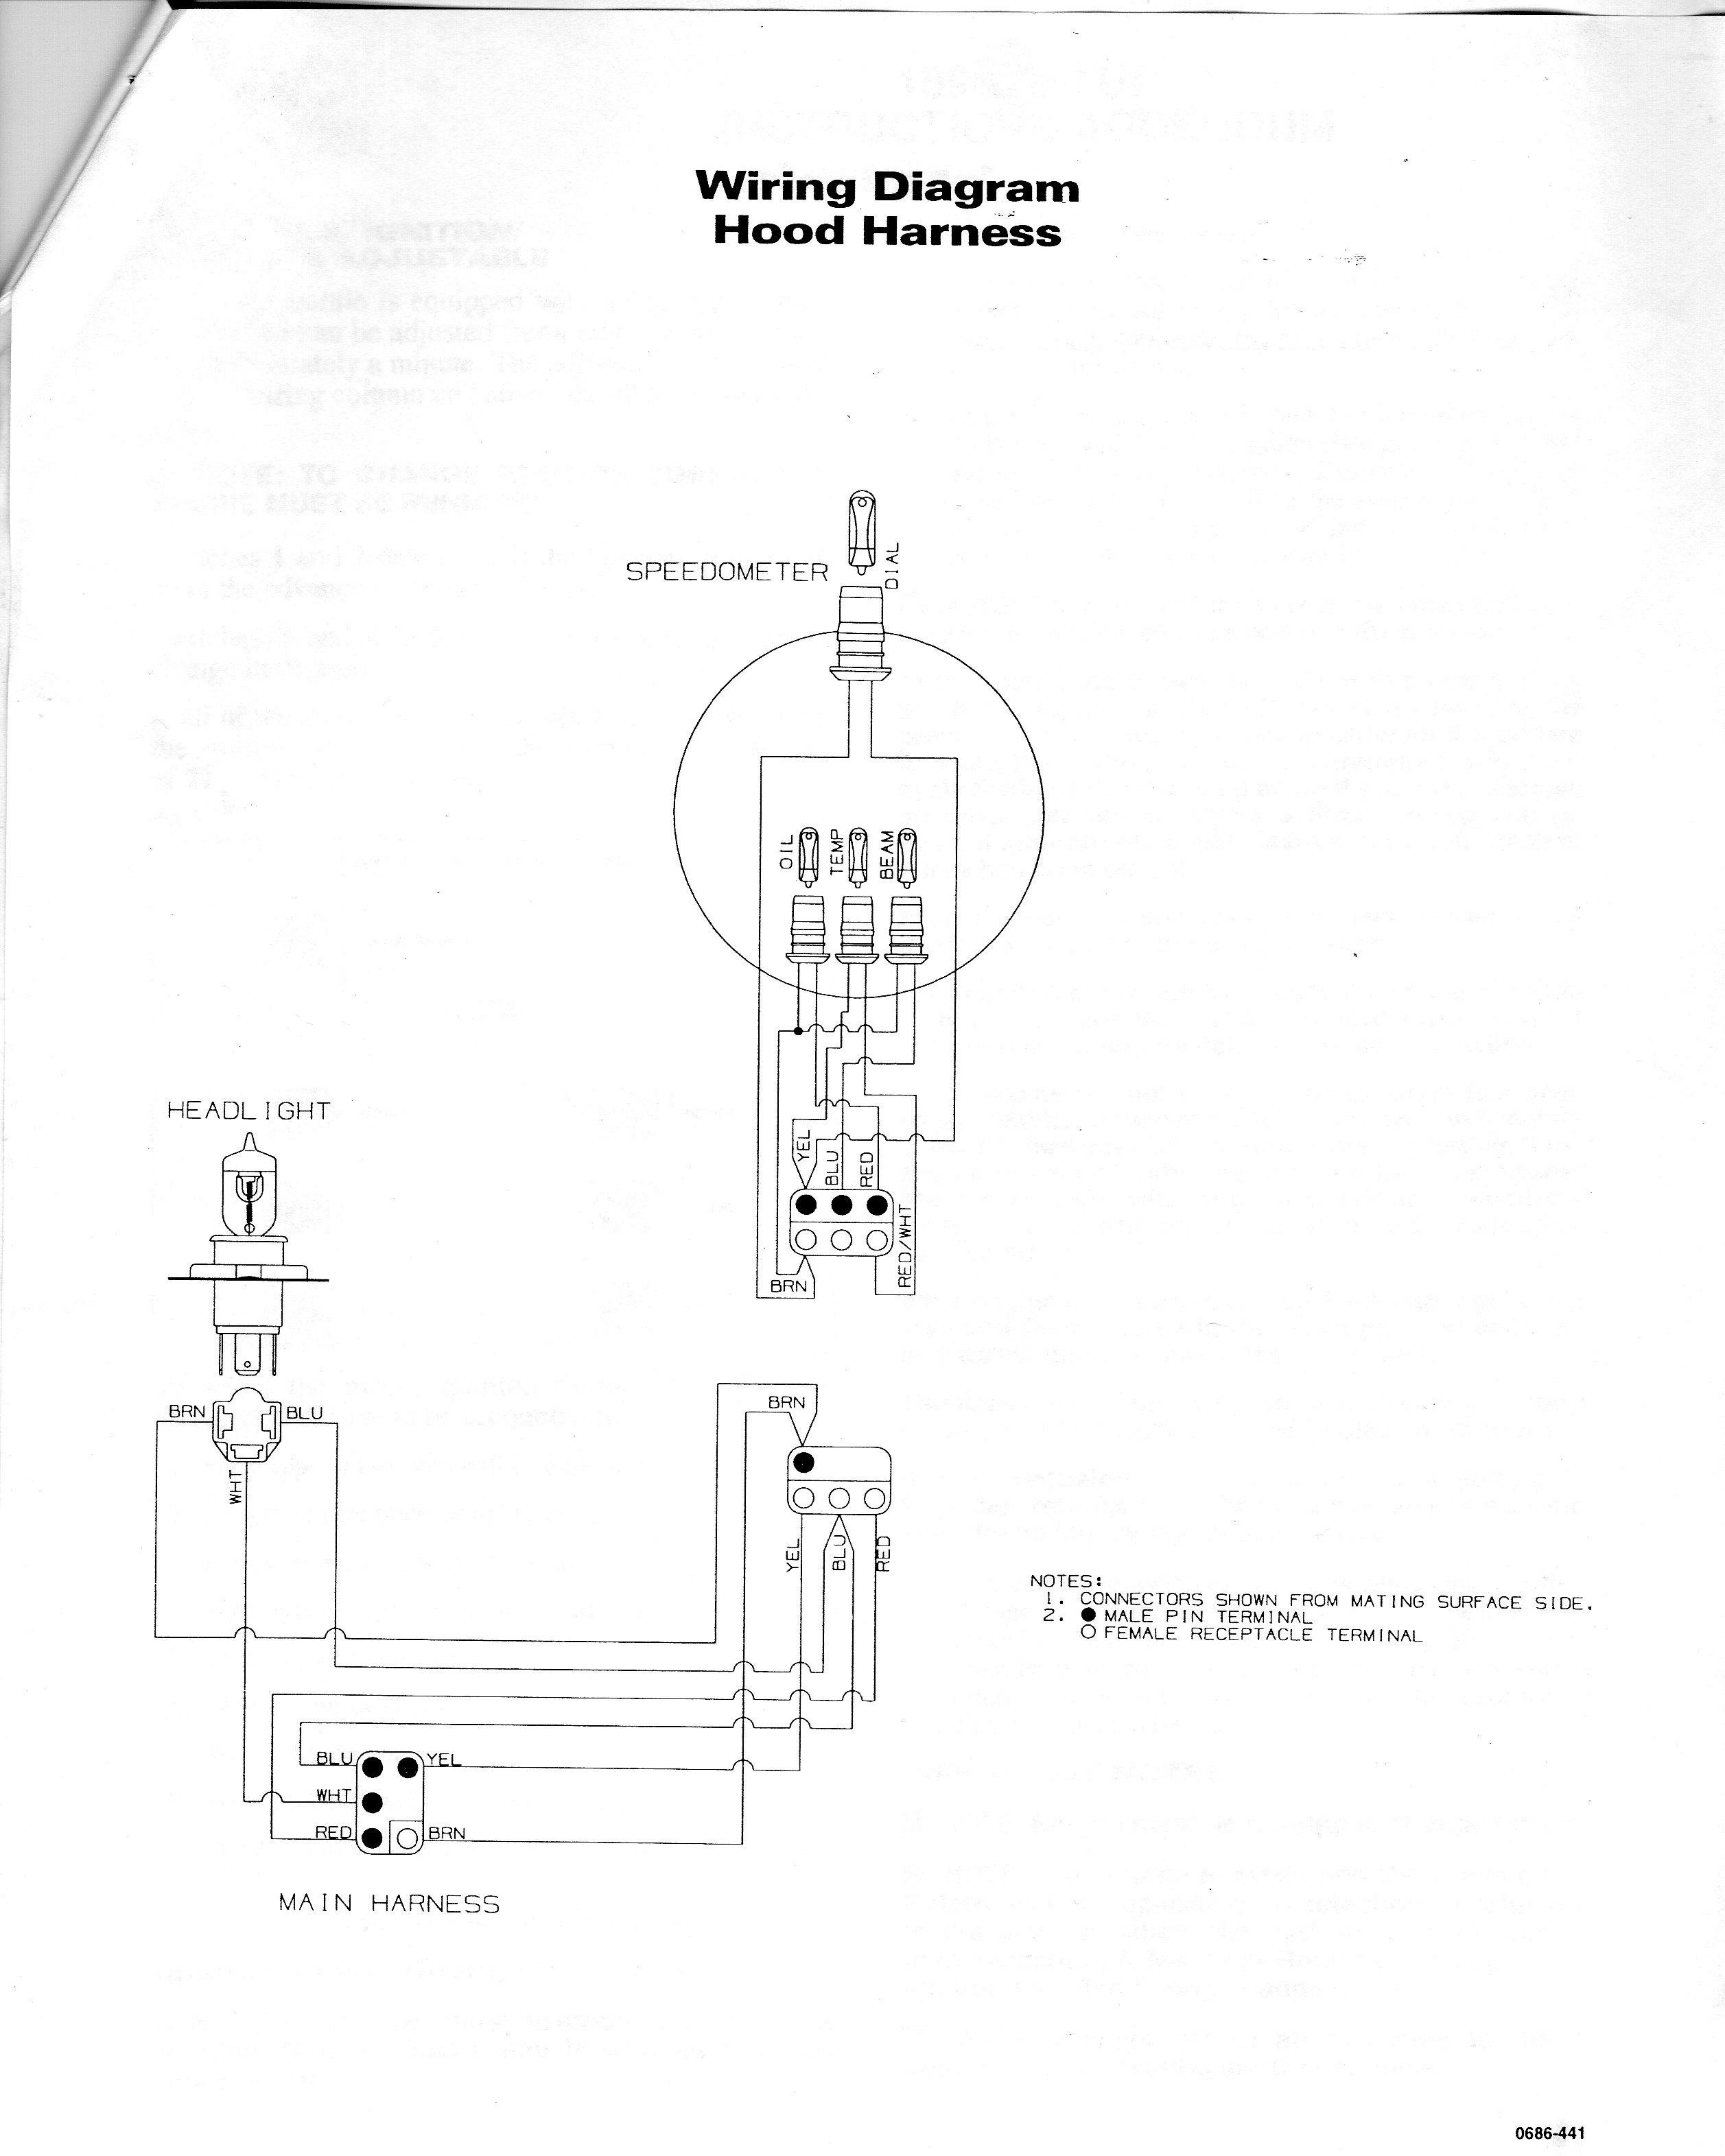 1998 setup instructions addendum - arcticchat com